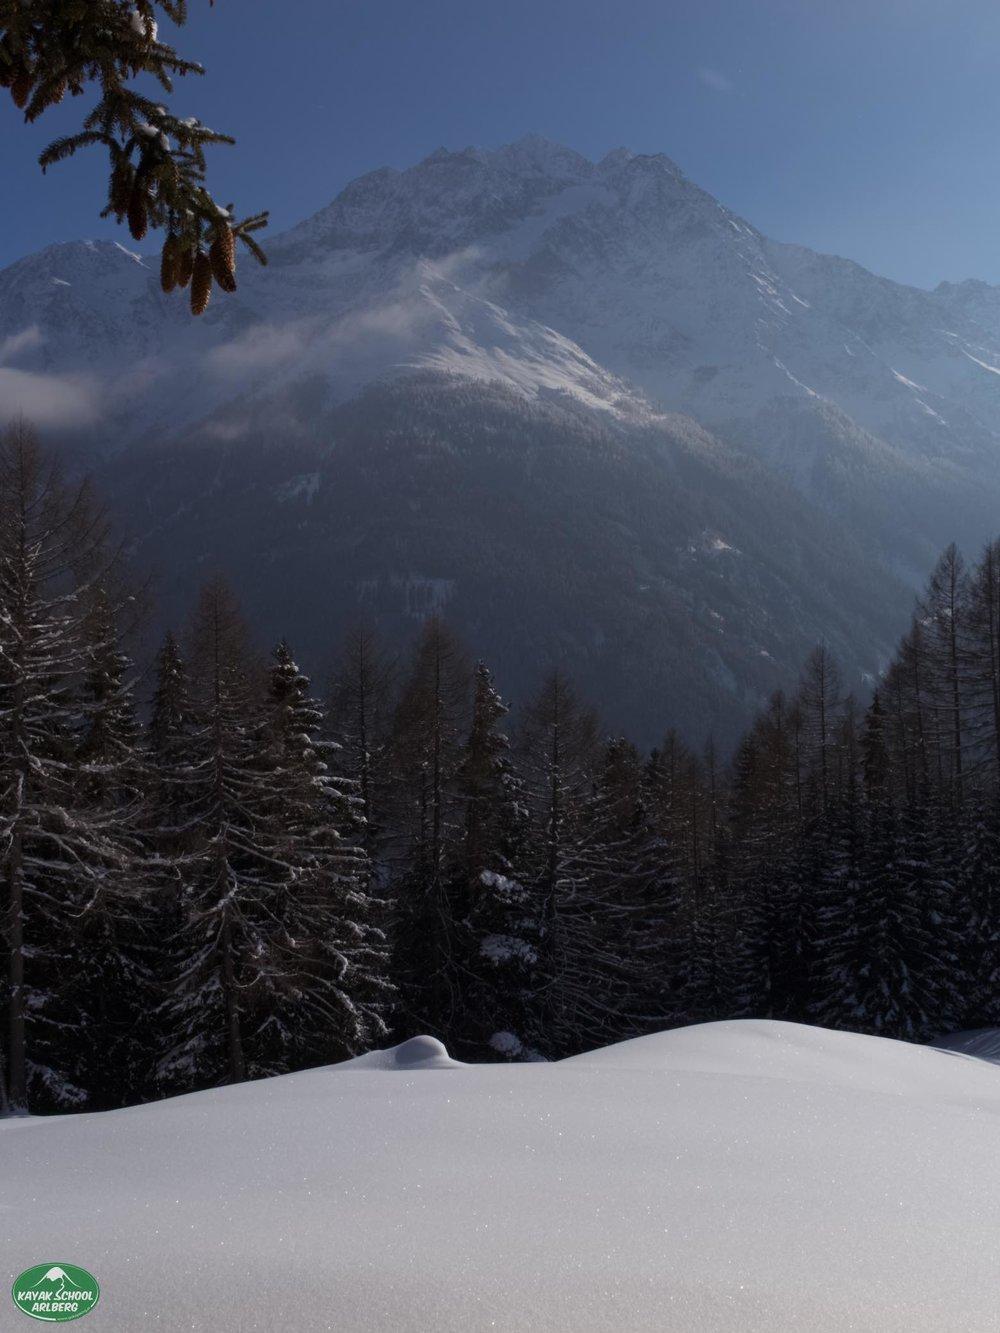 Winter-Skiing-Arlberg-Part-1-01.jpg